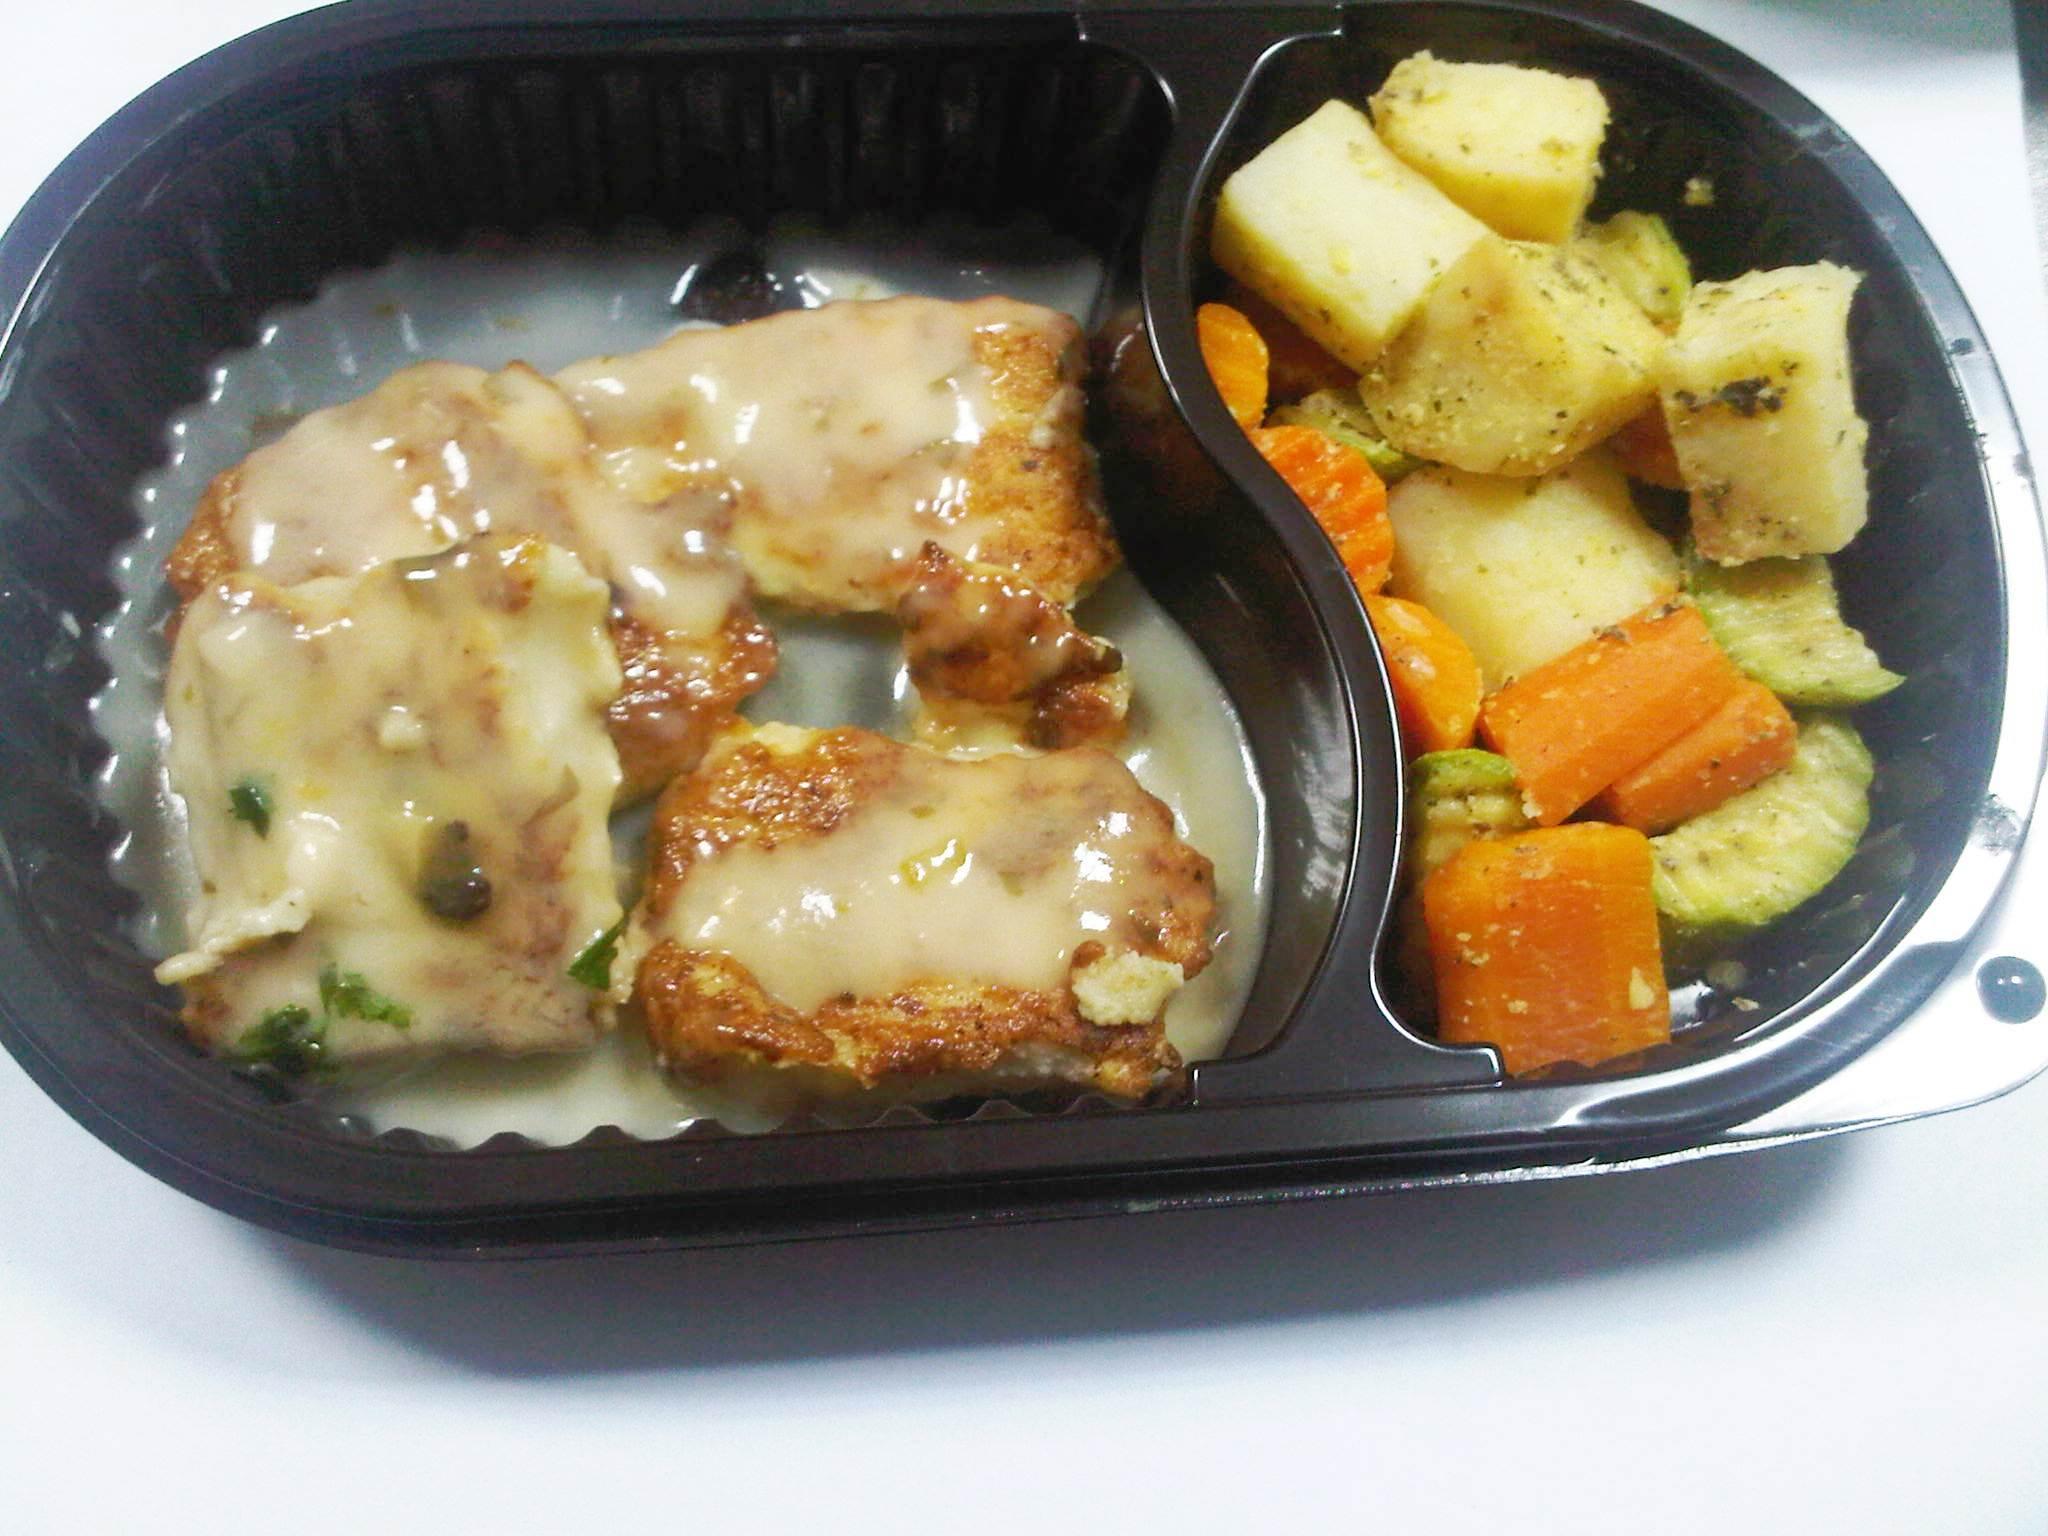 صورة وجبات دايت , اسهل و اسرع وجبات رجيم